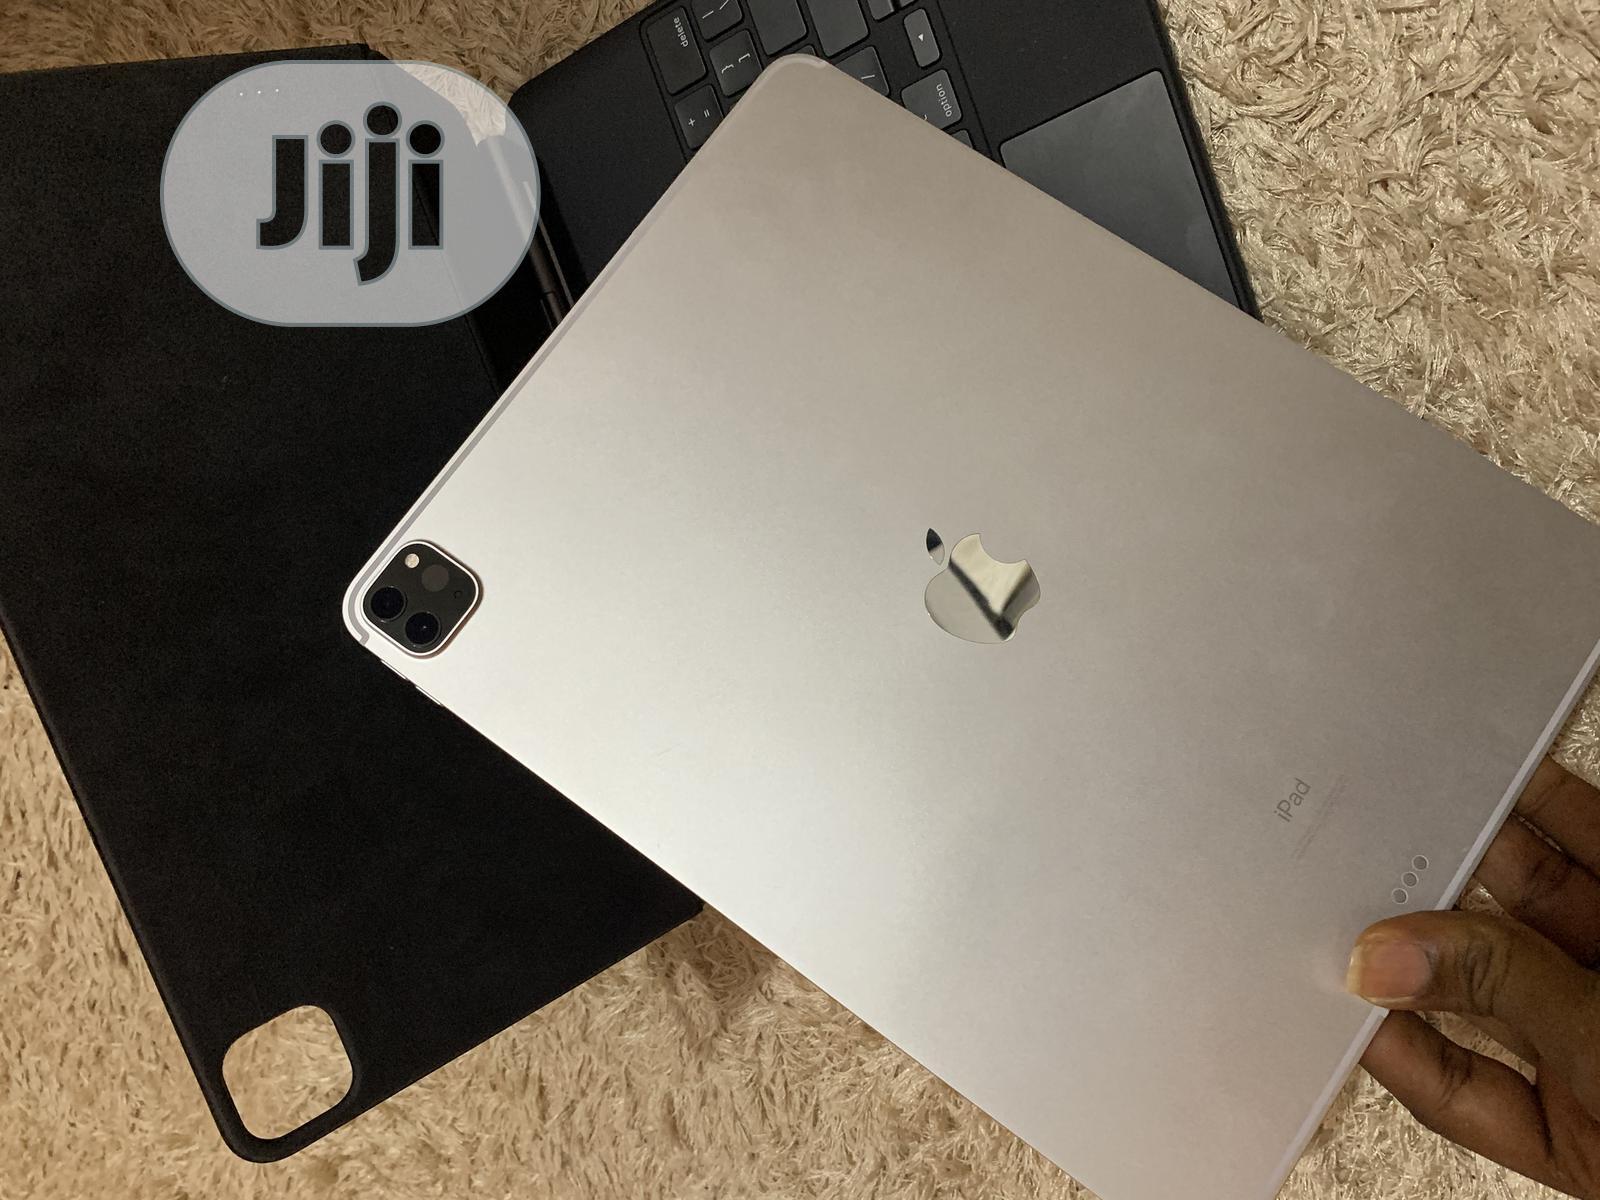 Apple iPad Pro 12.9 (2020) 128 GB Silver   Tablets for sale in Benin City, Edo State, Nigeria